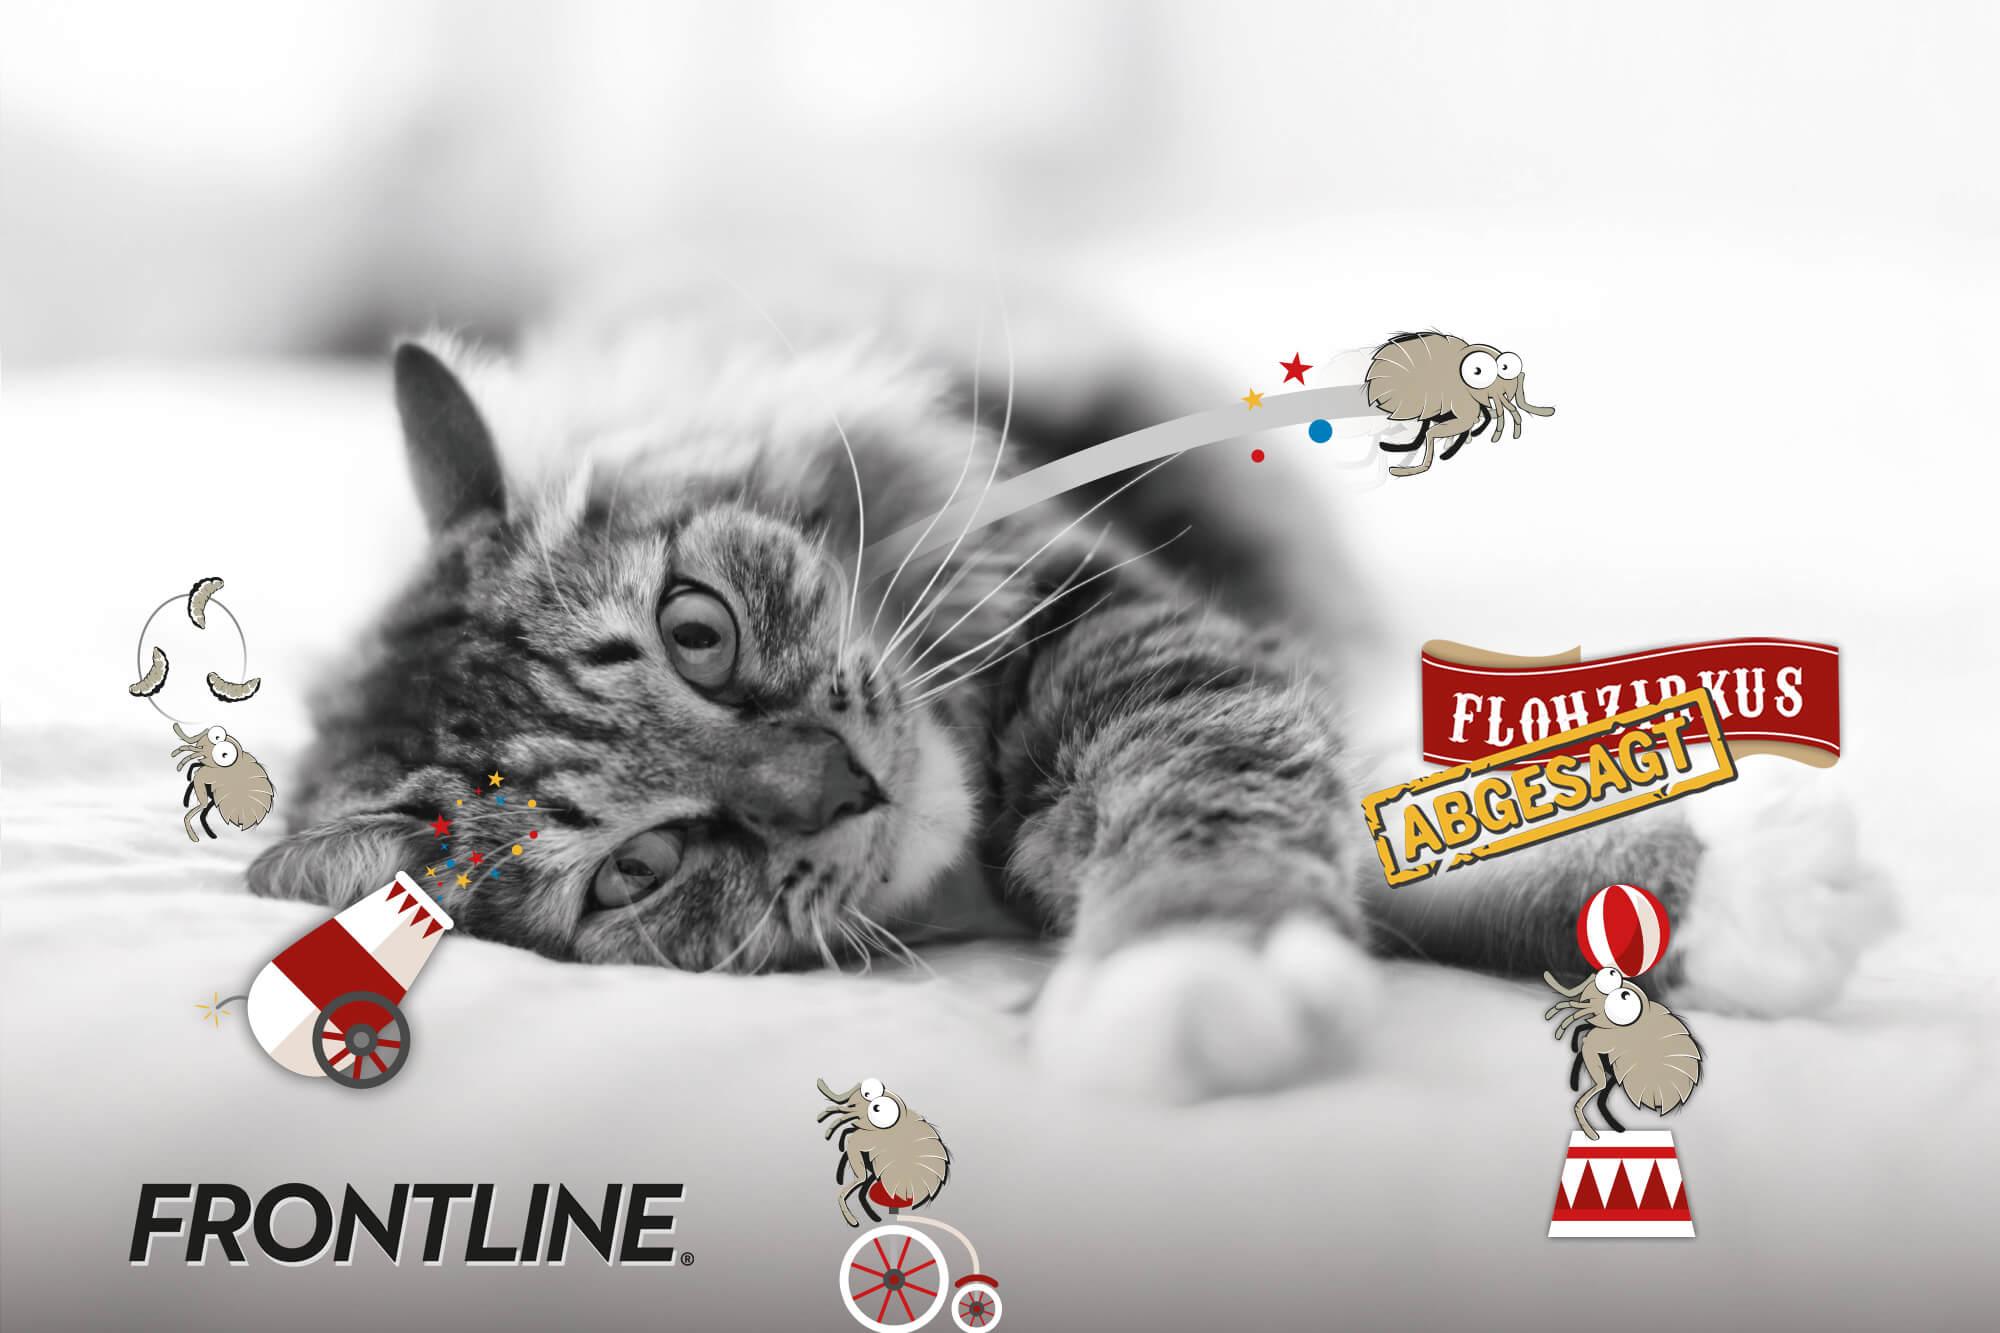 Frontline – OTC Kampagne am POS Apotheke & Digital